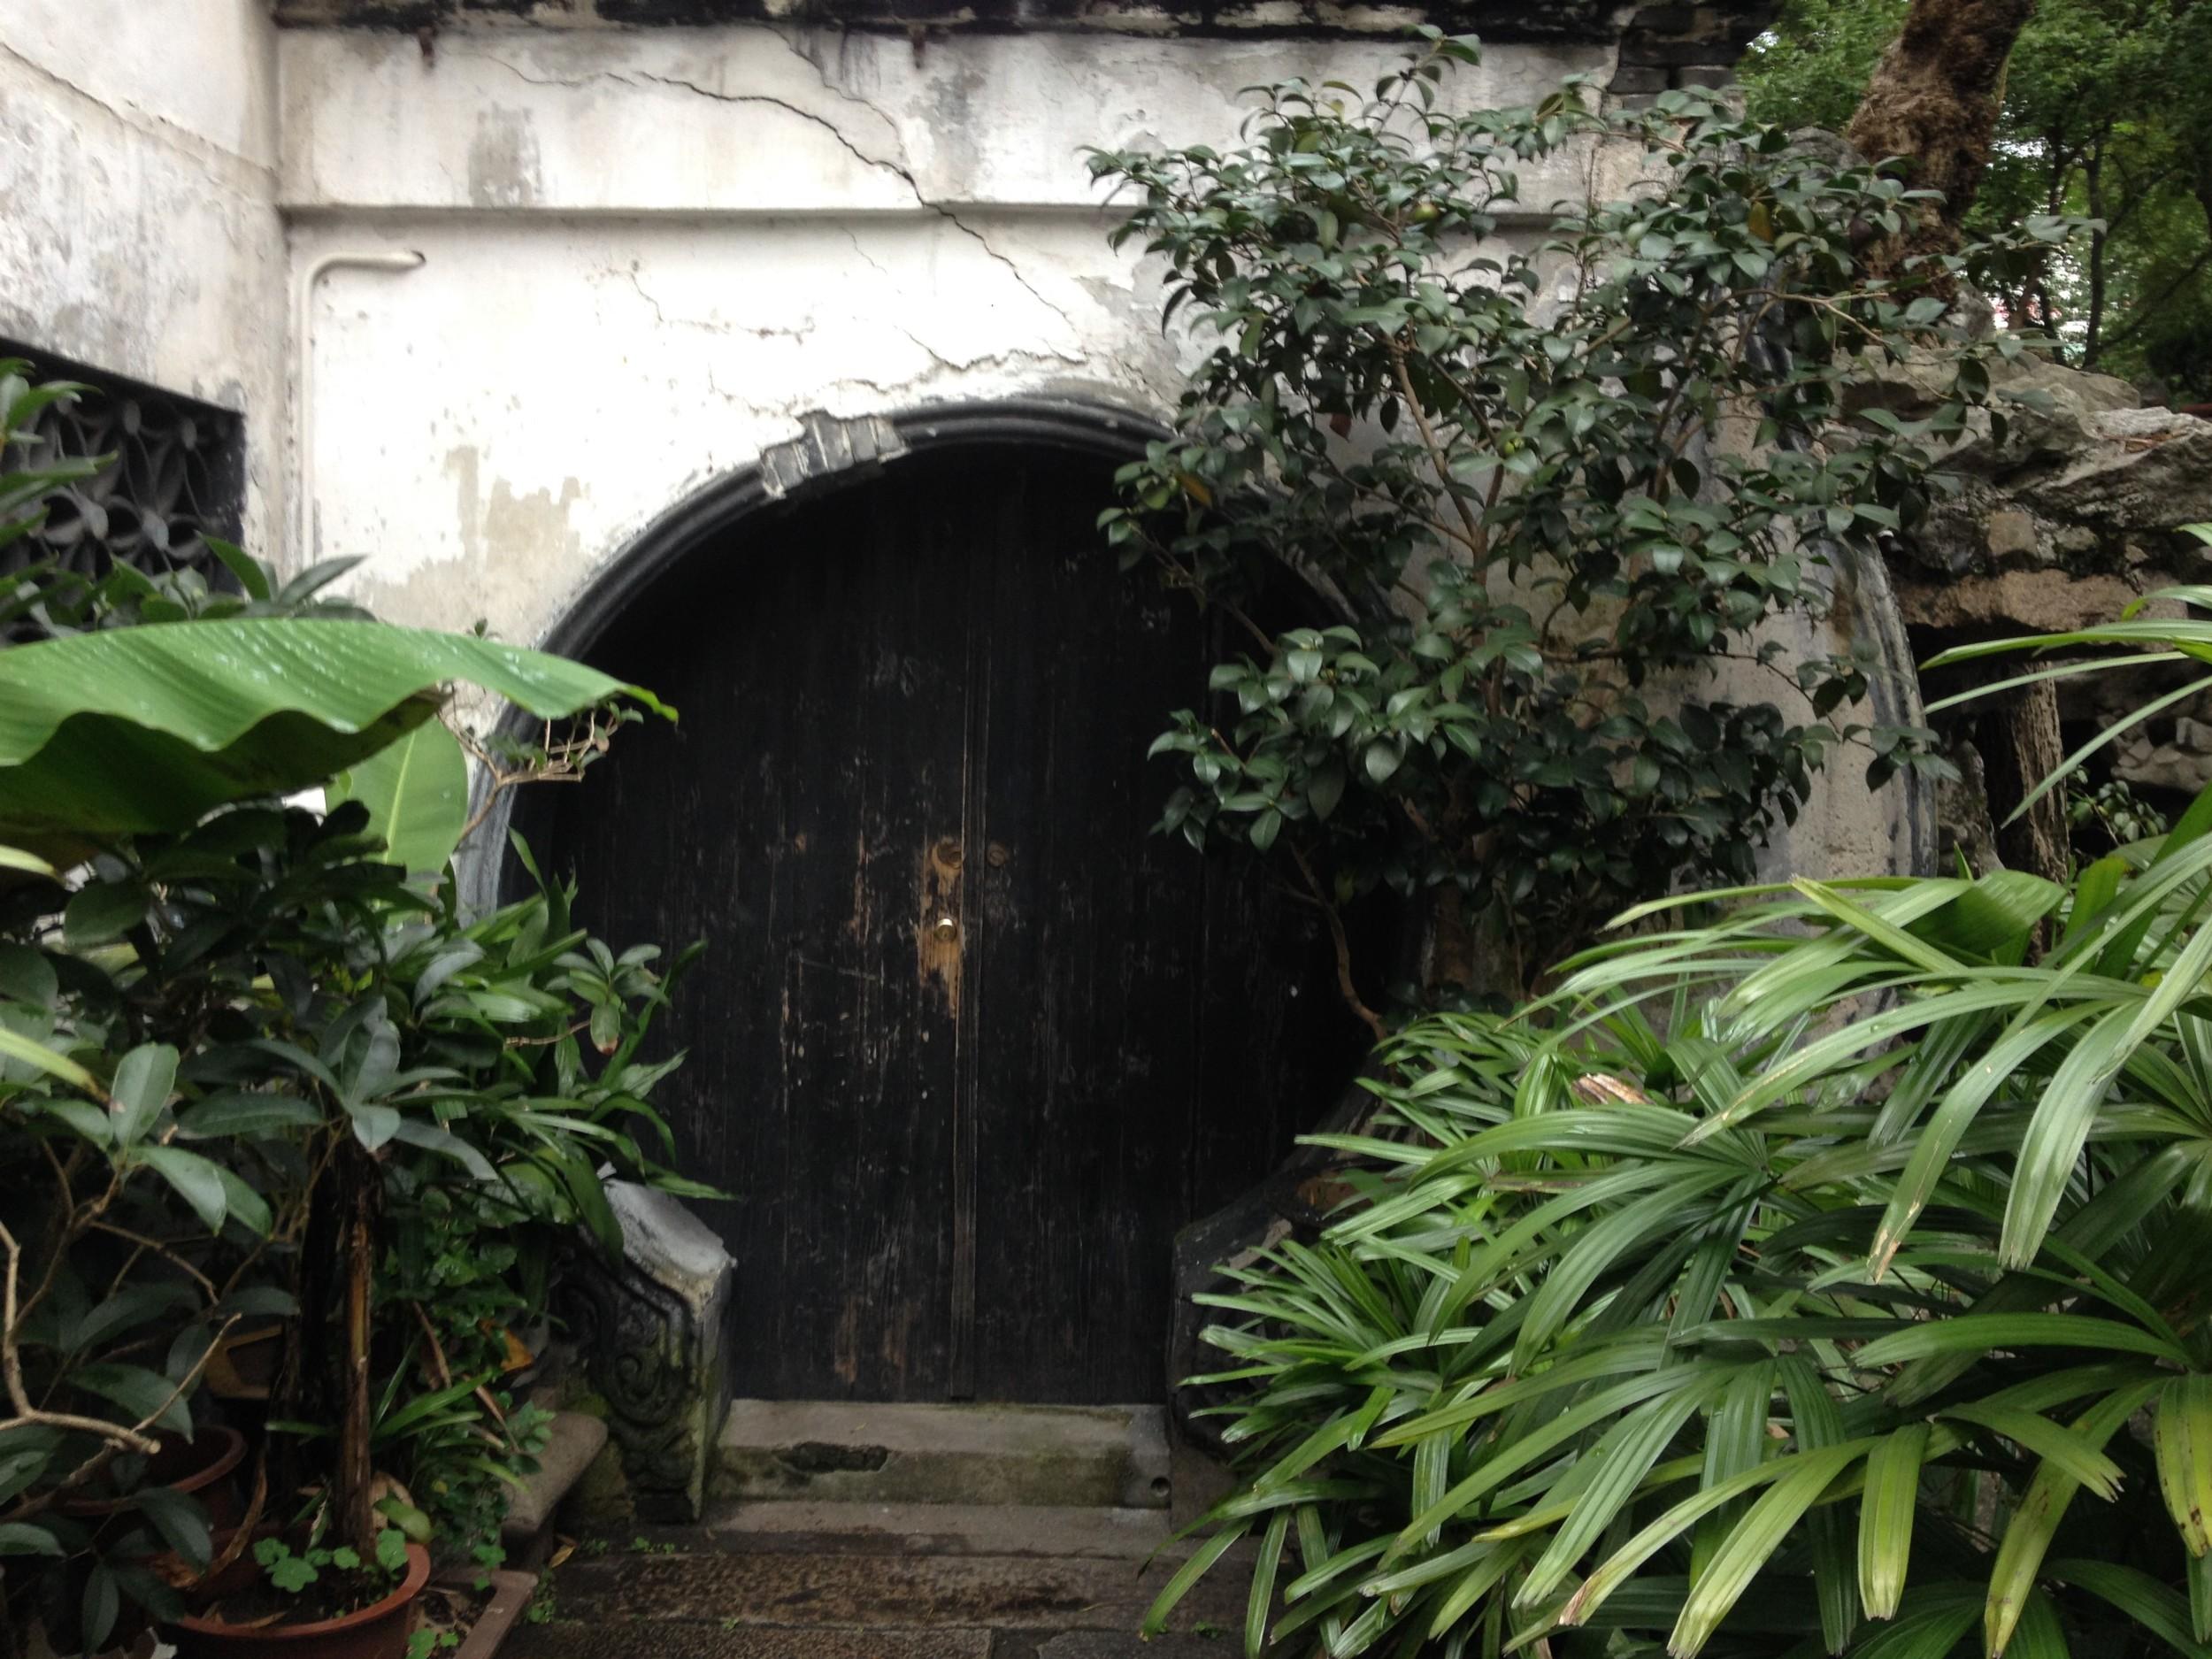 Details inside the gardens